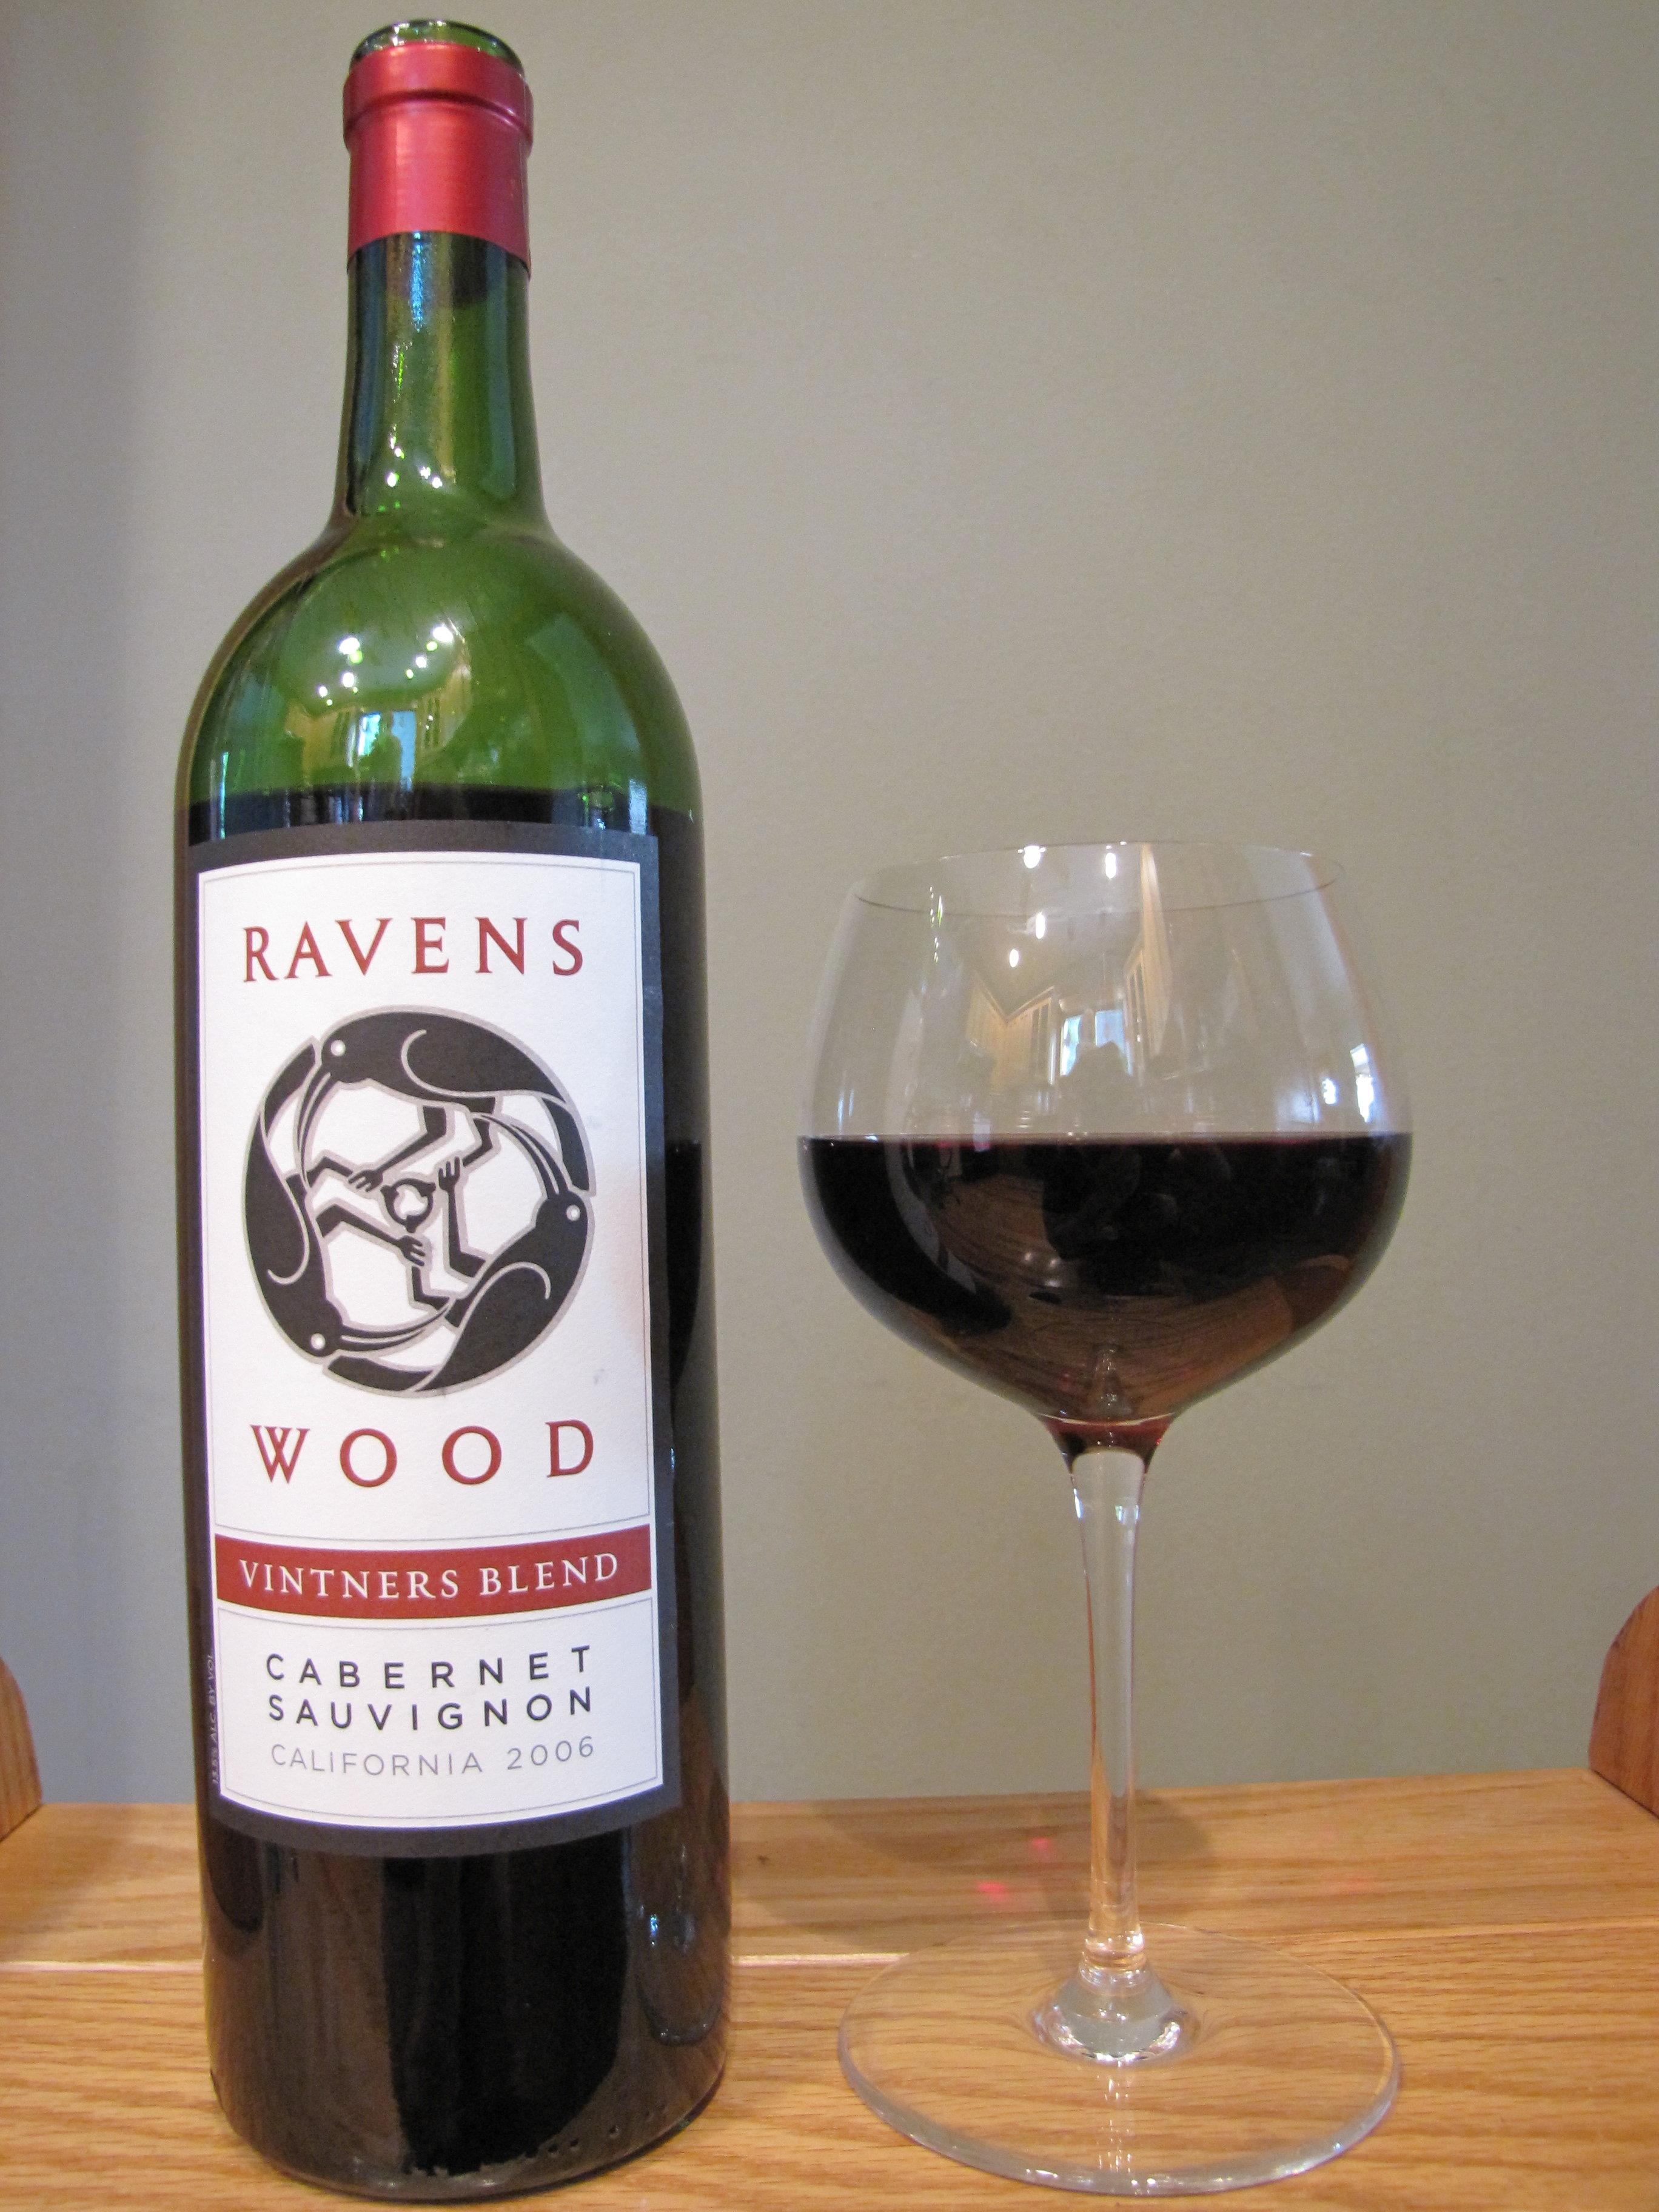 Ravenswood Cabernet Sauvignon Vintners Blend (2006)